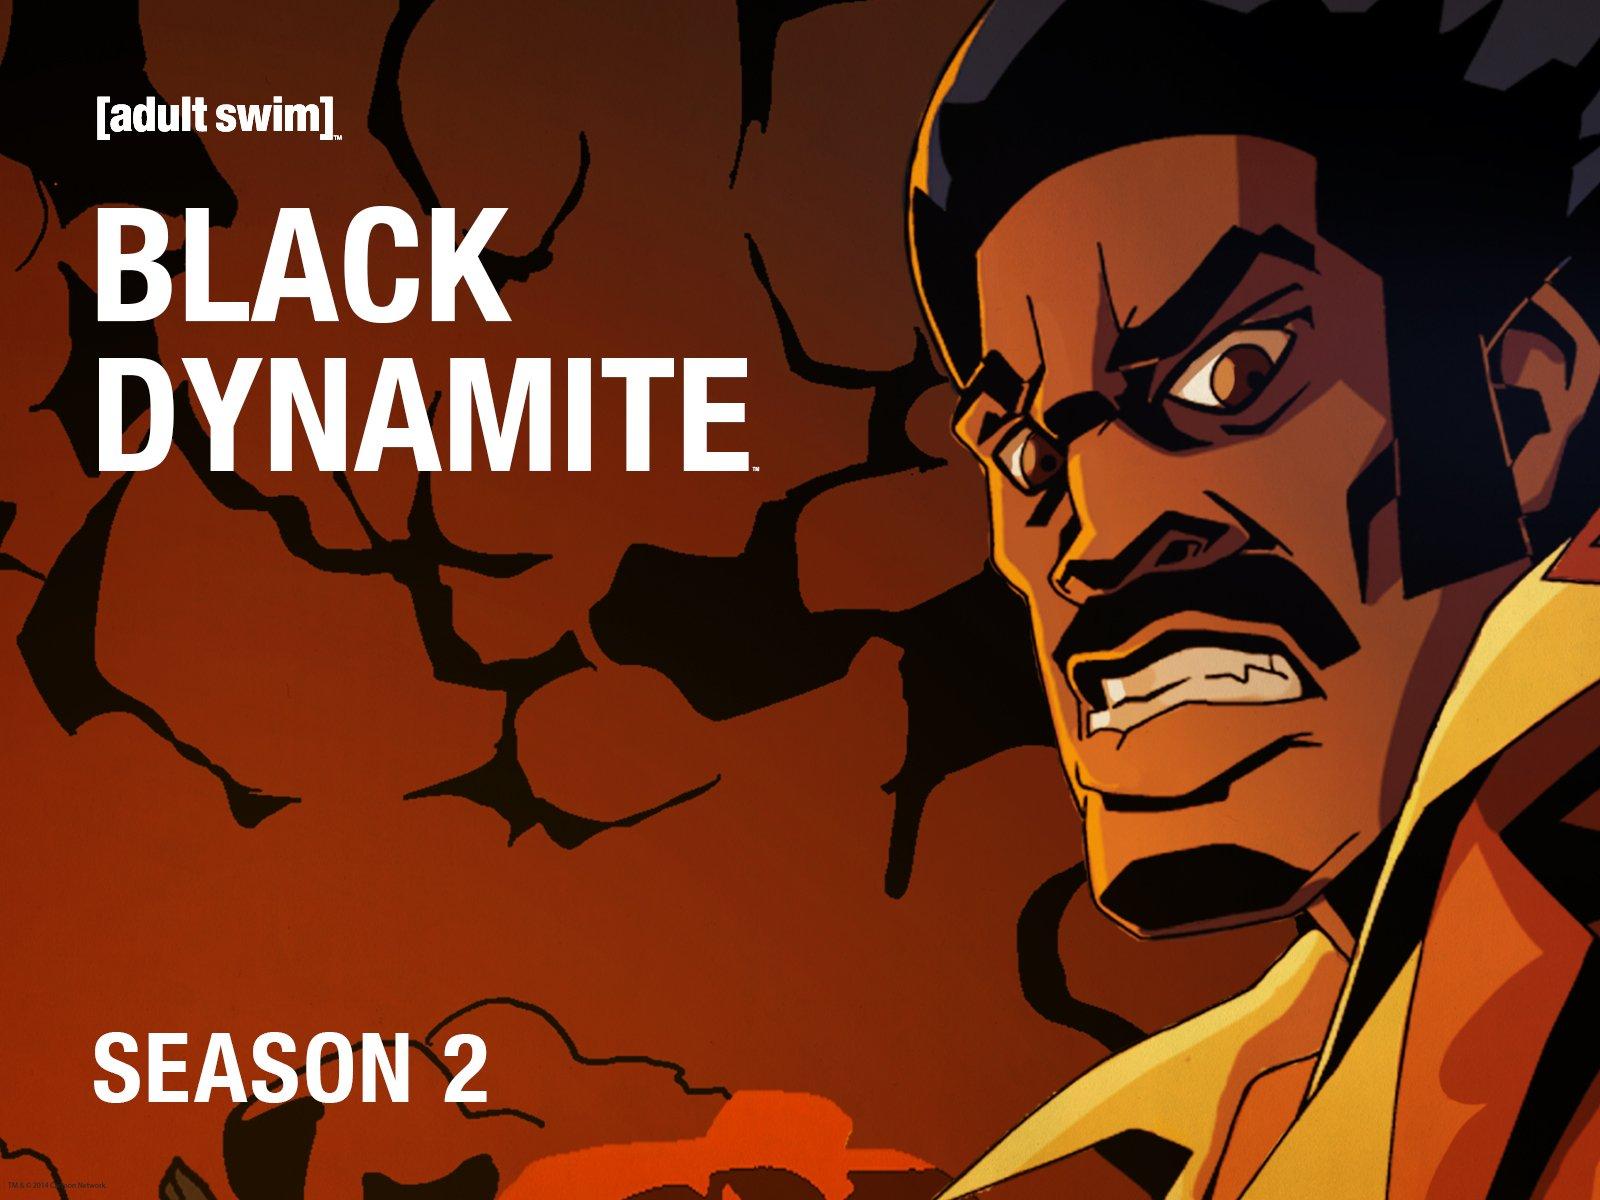 Have forgotten Black adult cartoon opinion